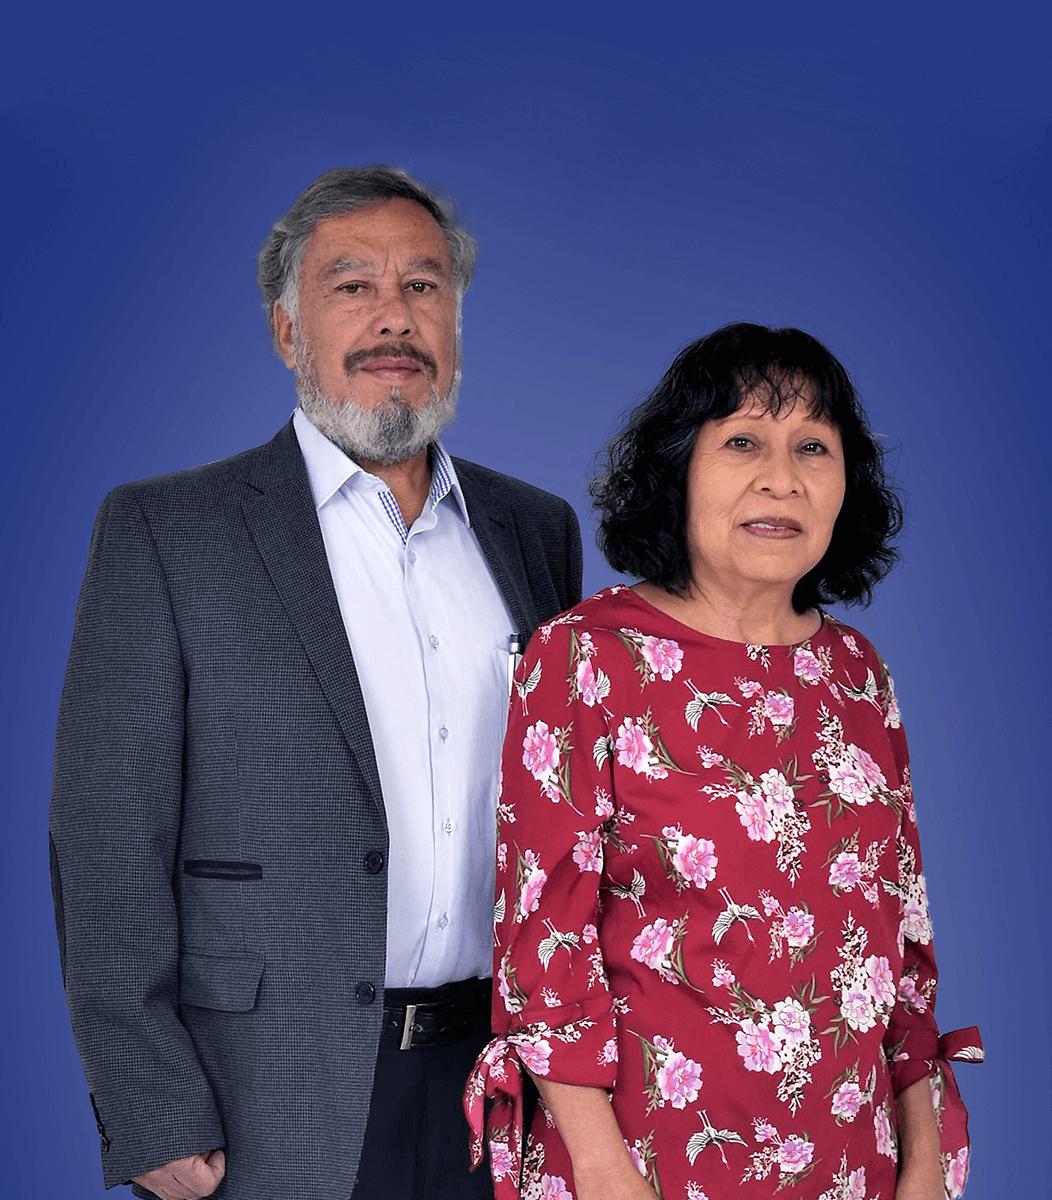 Alberto Huerta y Araceli Ibarra   Centro de Vida Cristiana